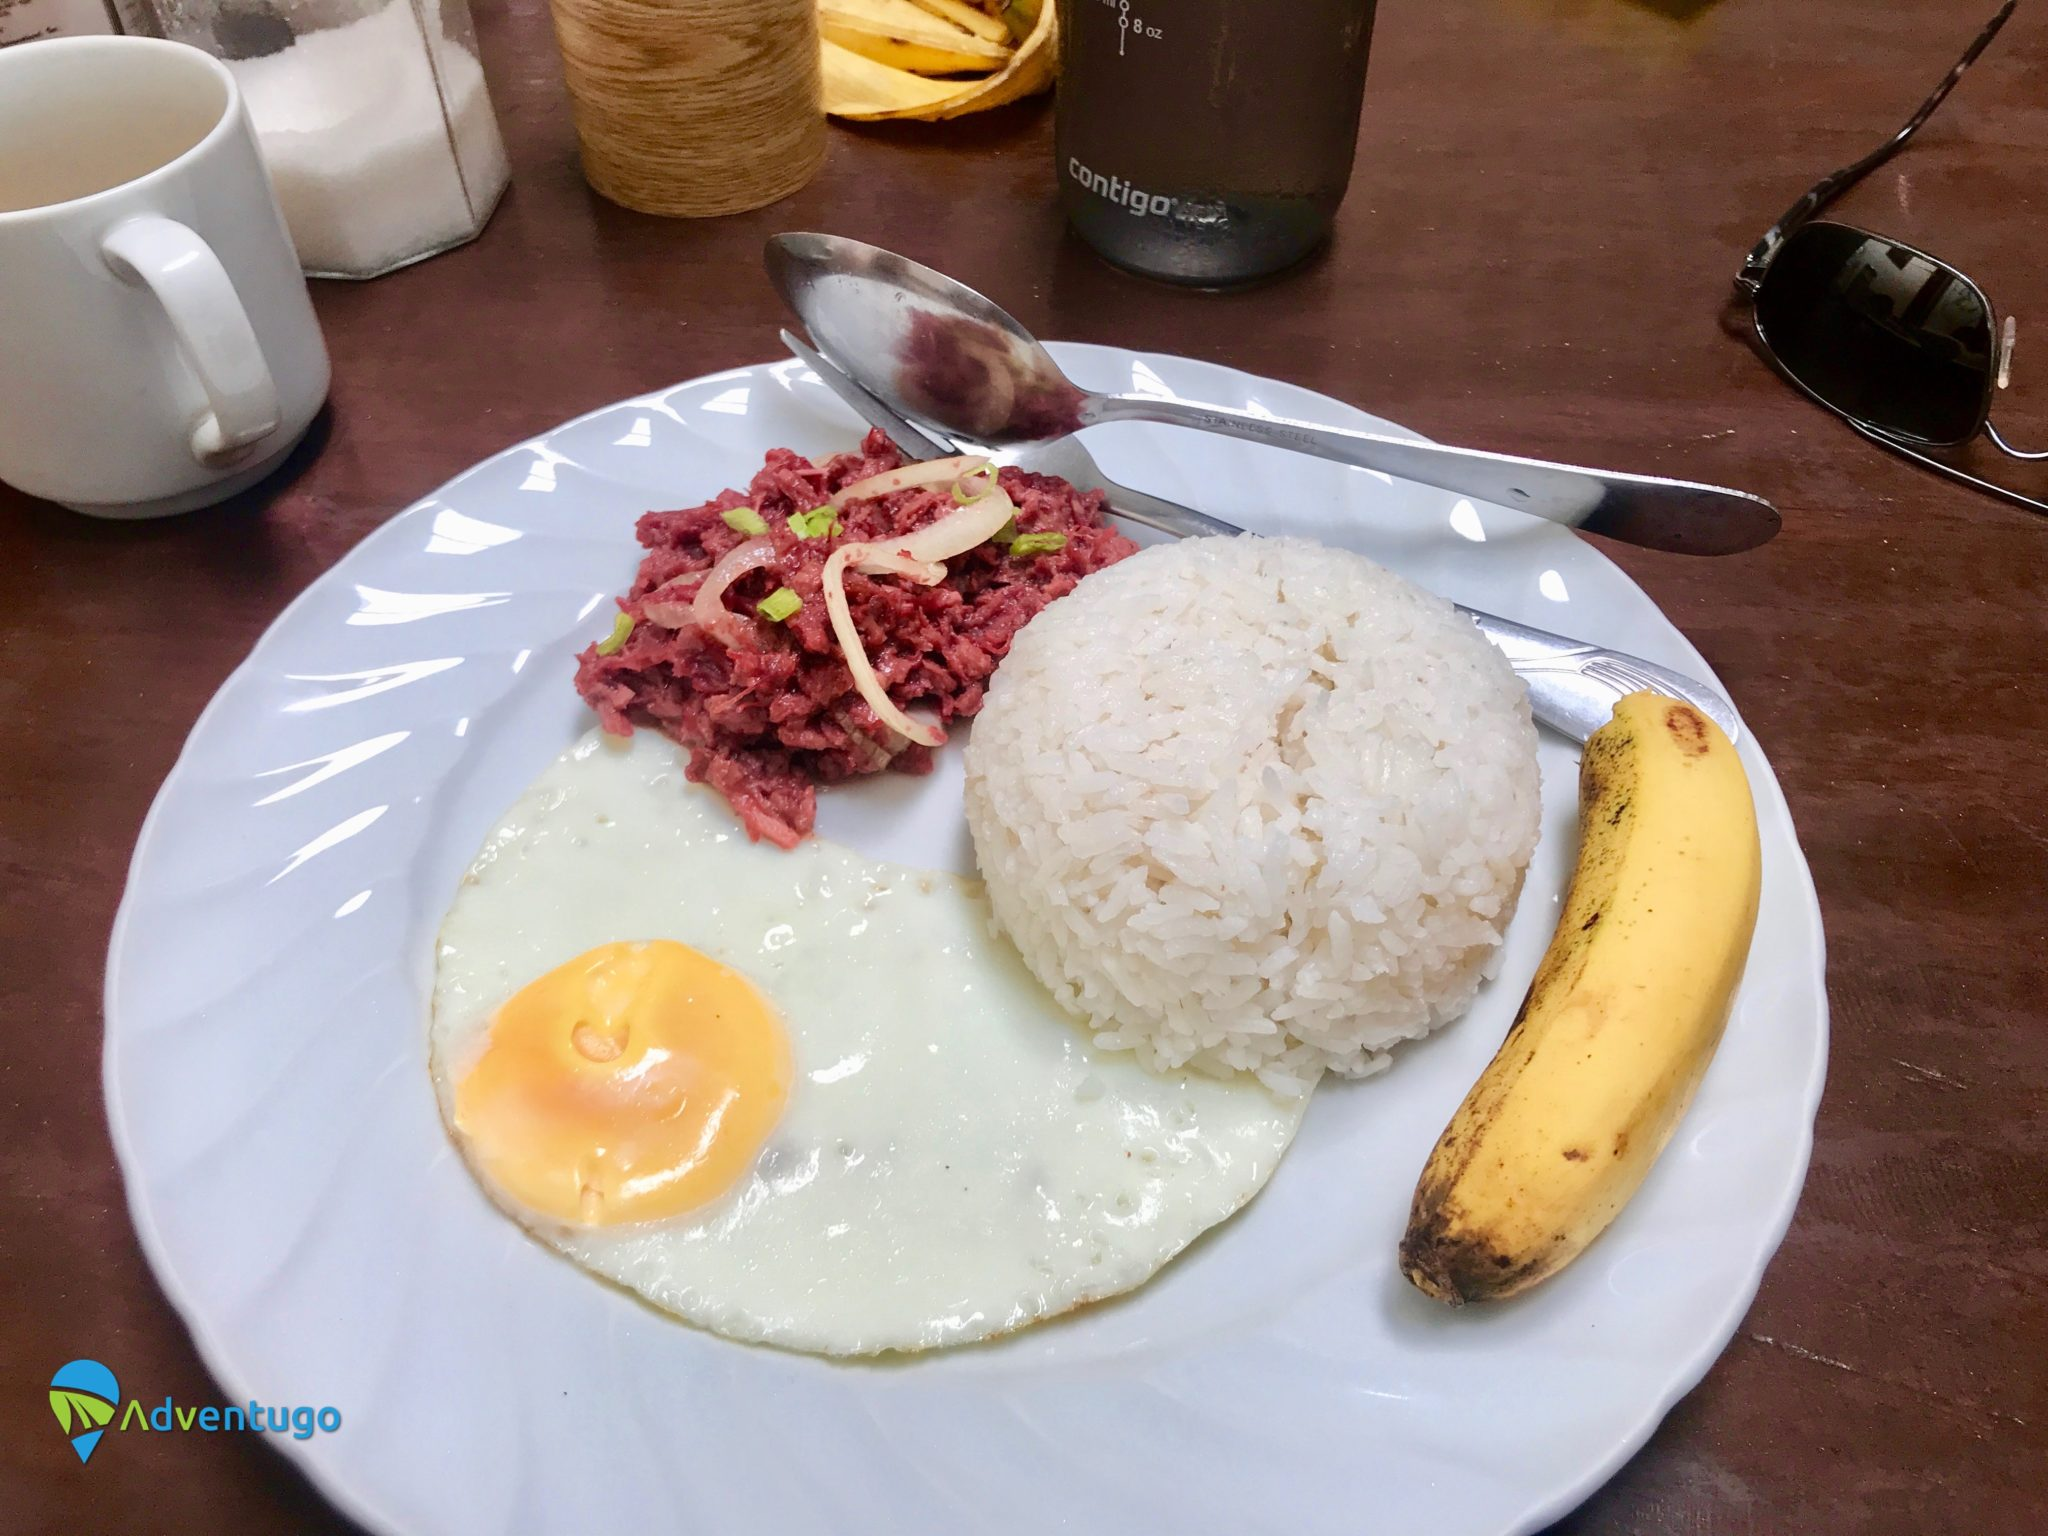 Corn Silog, Philippines Breakfast dish